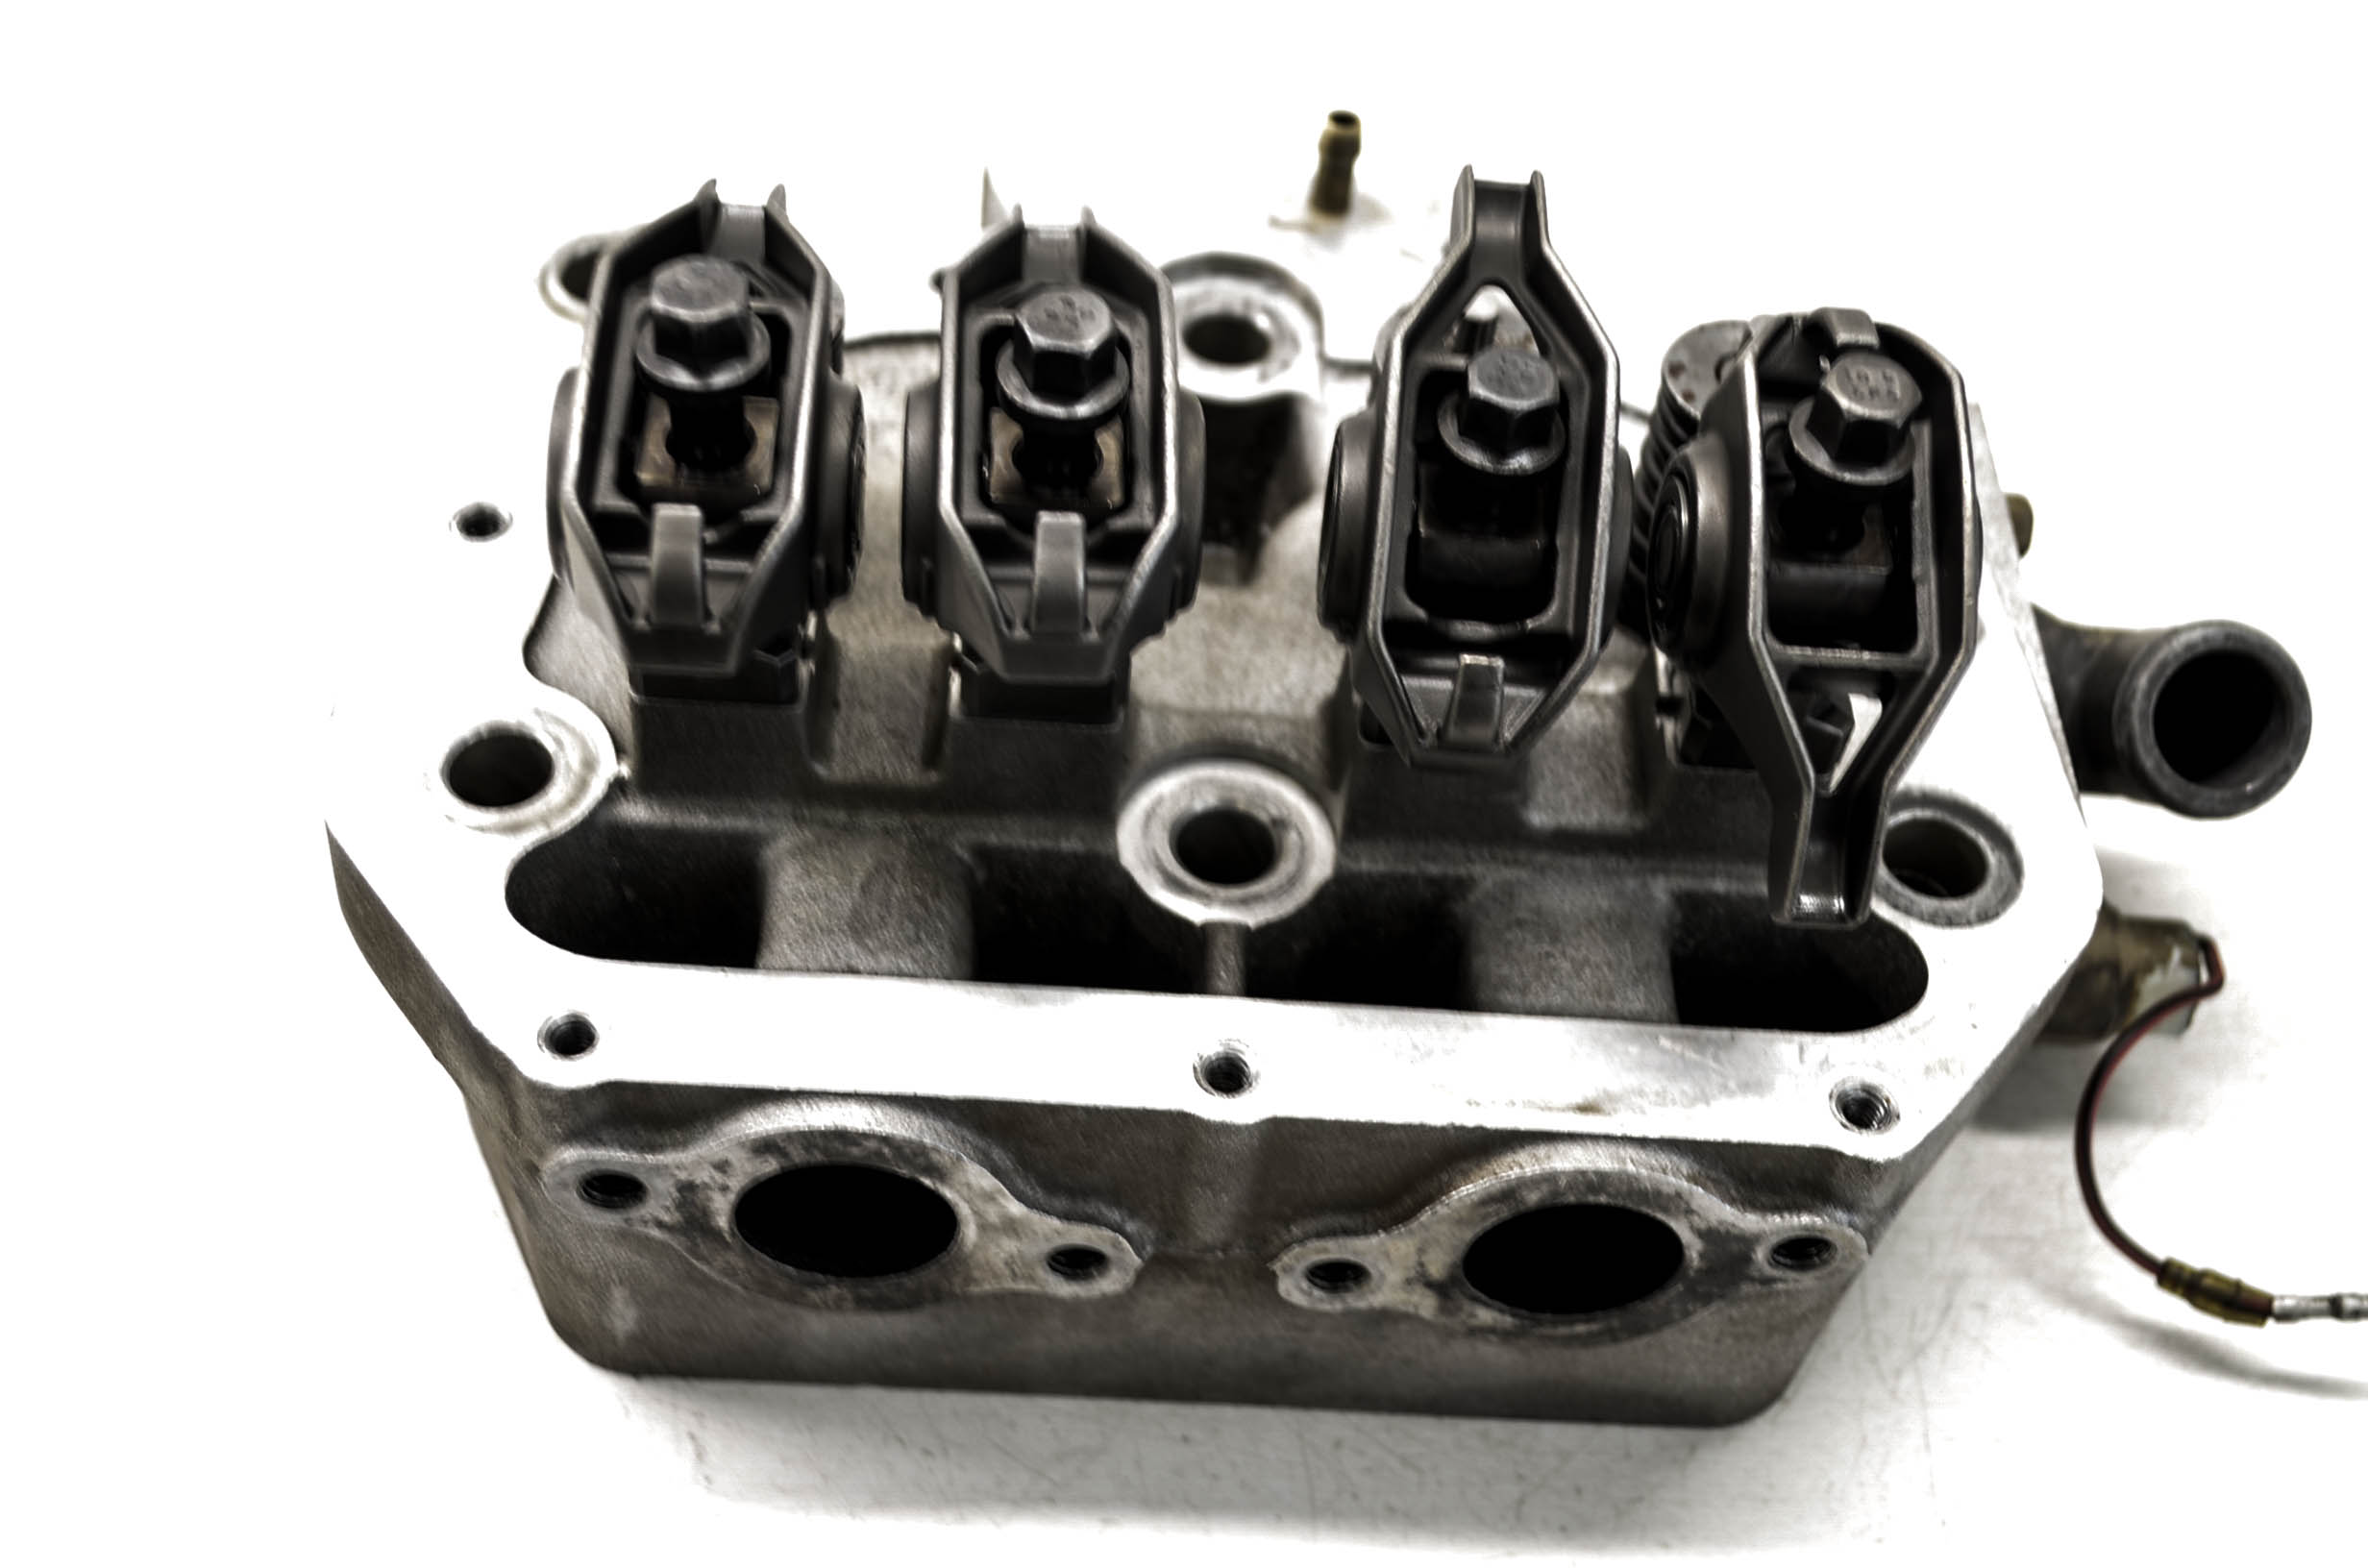 03 Polaris Sportsman 700 Twin 4x4 Cylinder Head